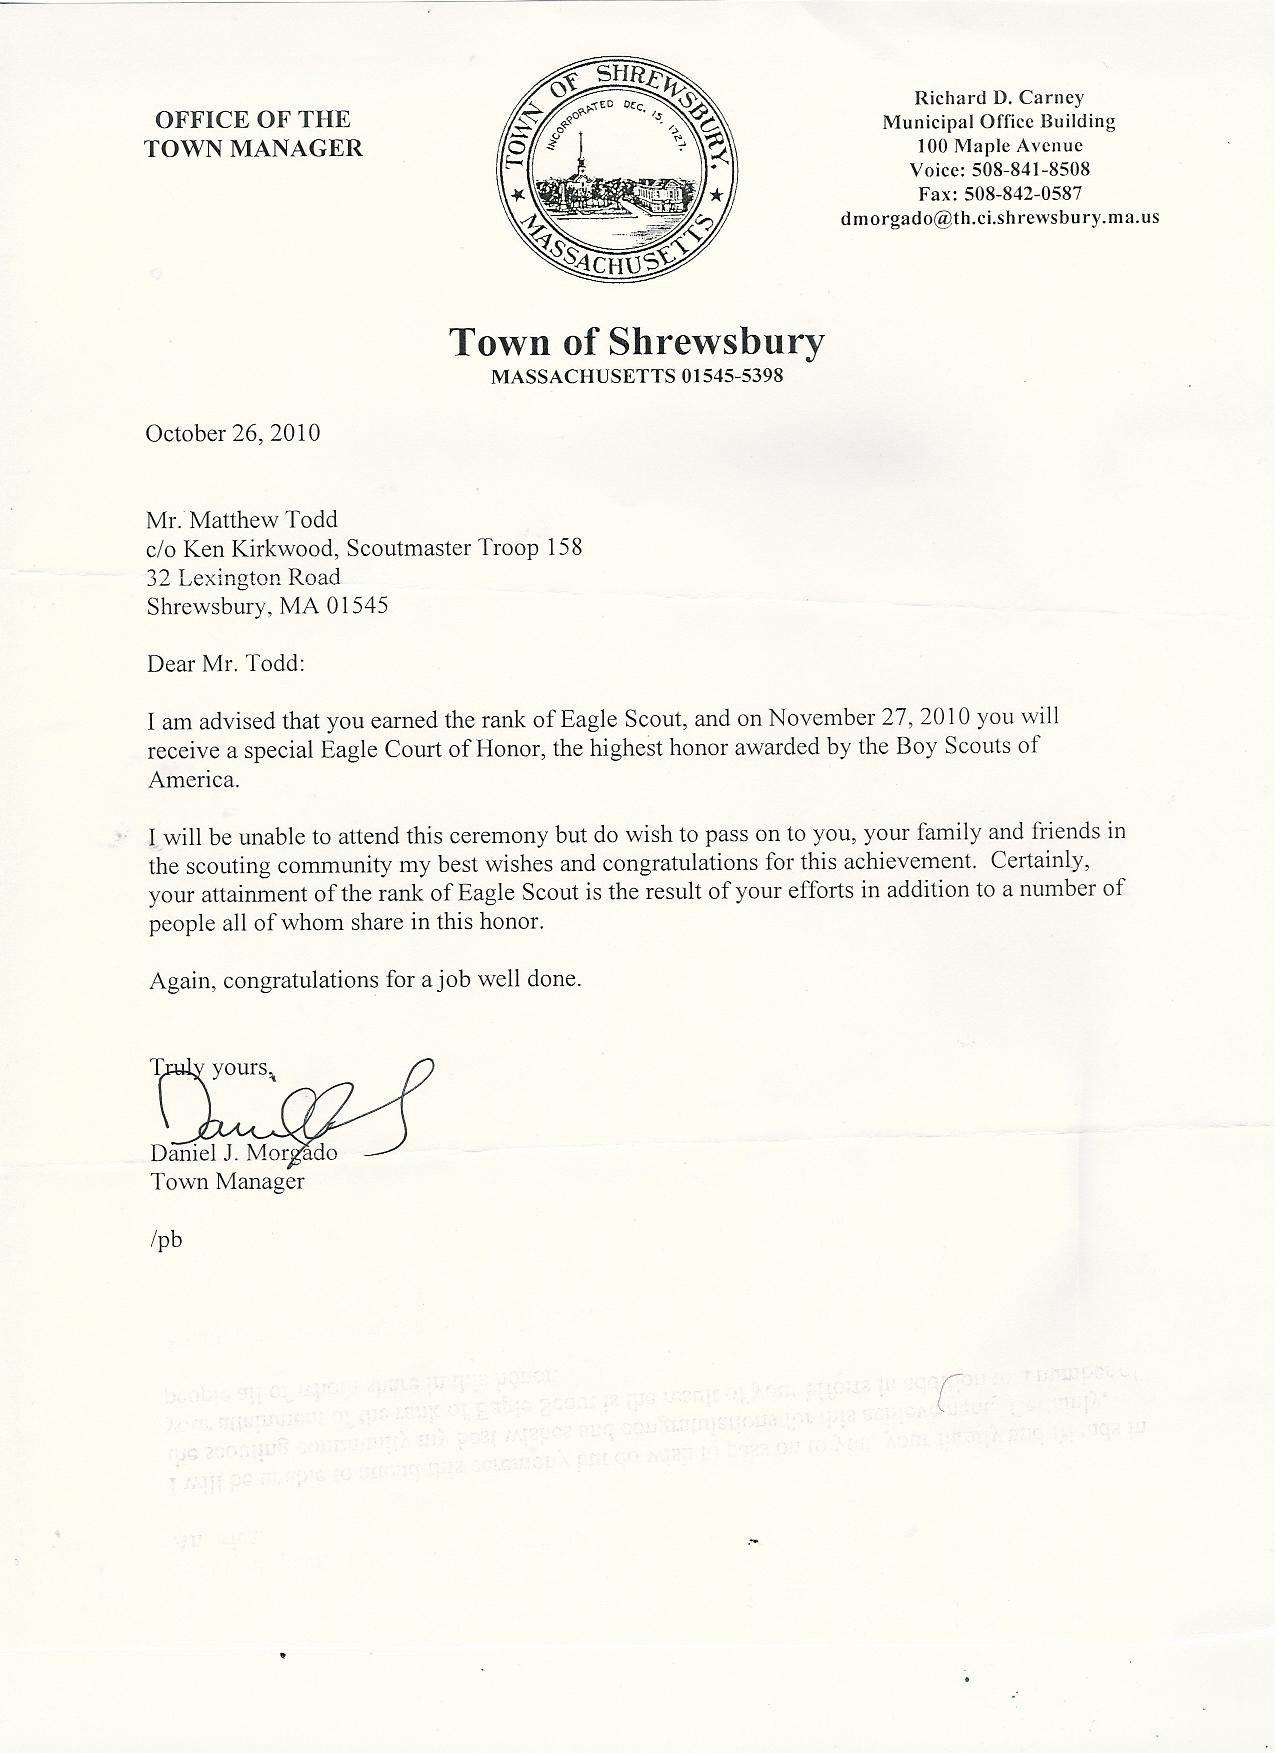 Eagle Scout Recommendation Letter Template Examples  Letter Templates Pertaining To Eagle Scout Recommendation Letter Template